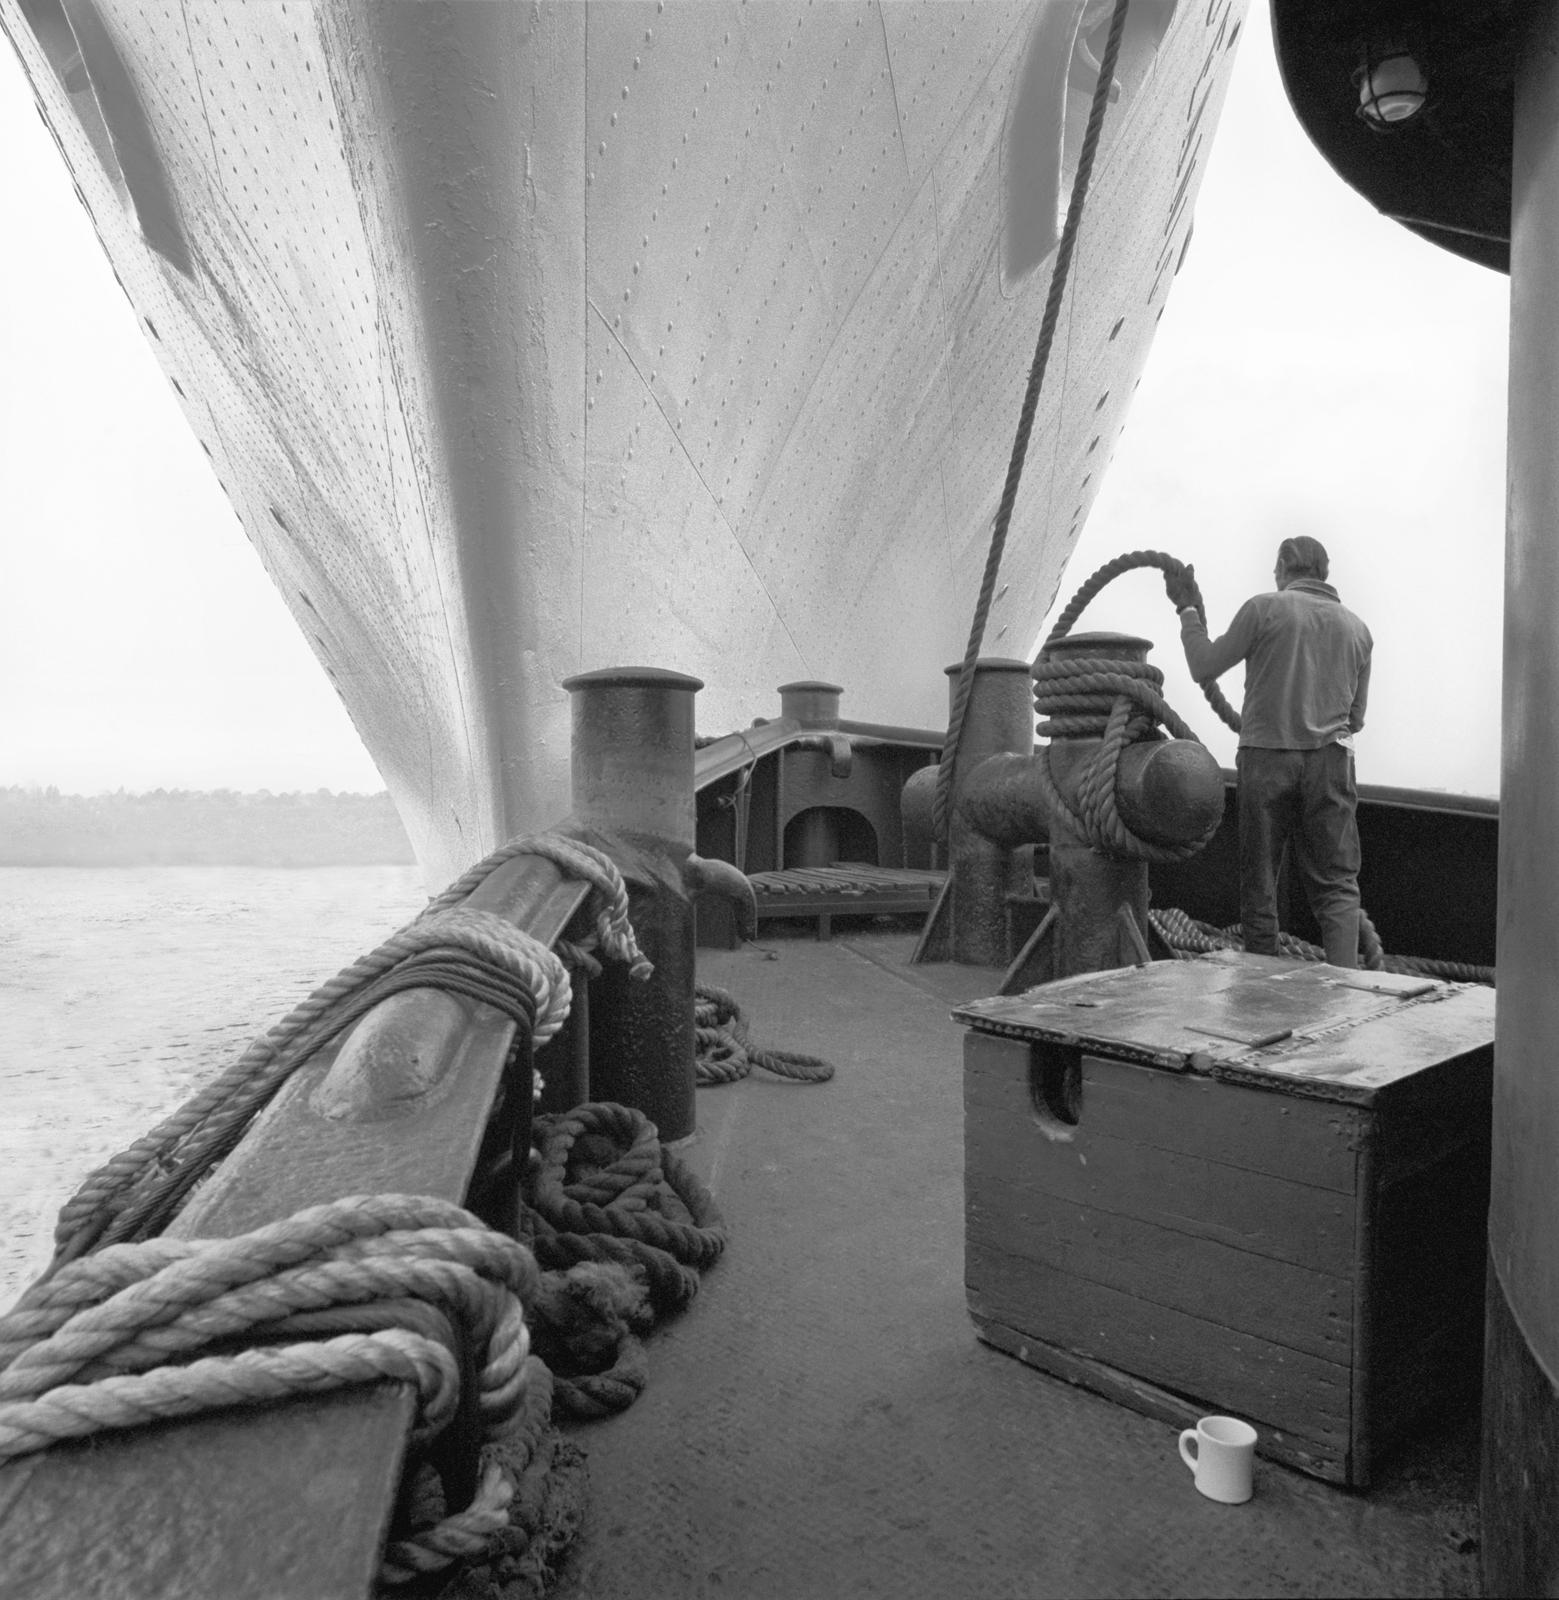 Ollie Woodcock, deckhand, tug Julia C. Moran, Hudson River, New York, New York, 1975